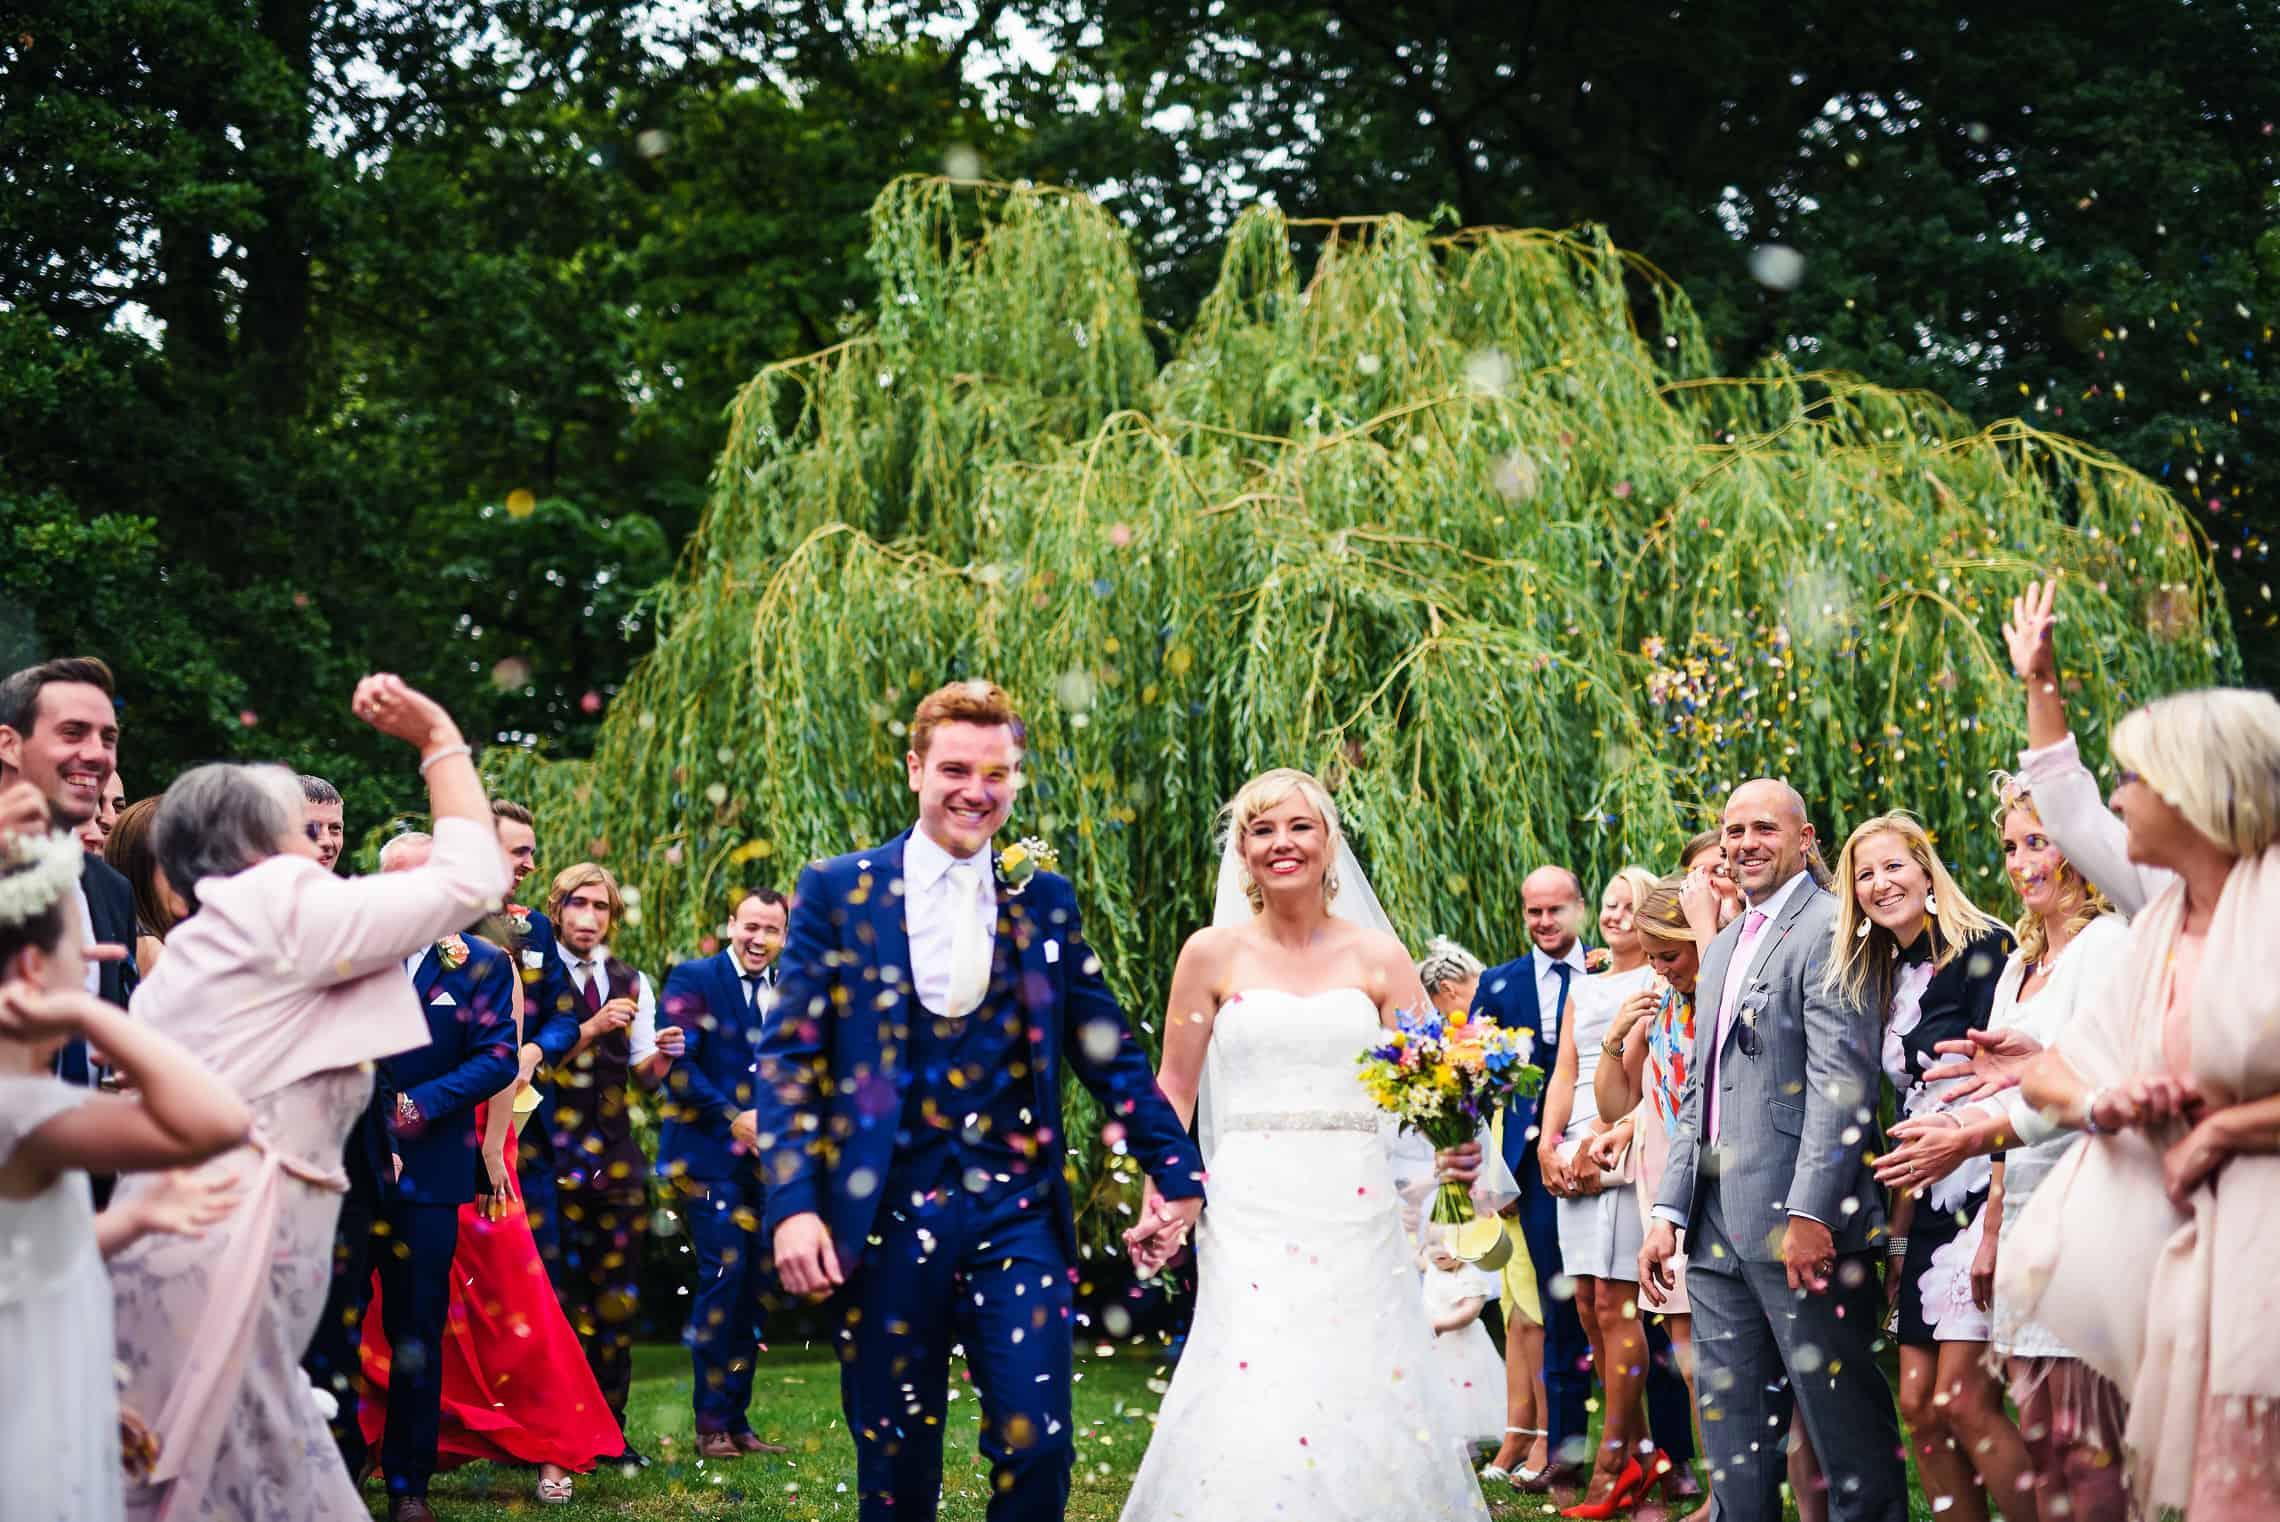 blake_hall_wedding_bc_justin_bailey_photography_031